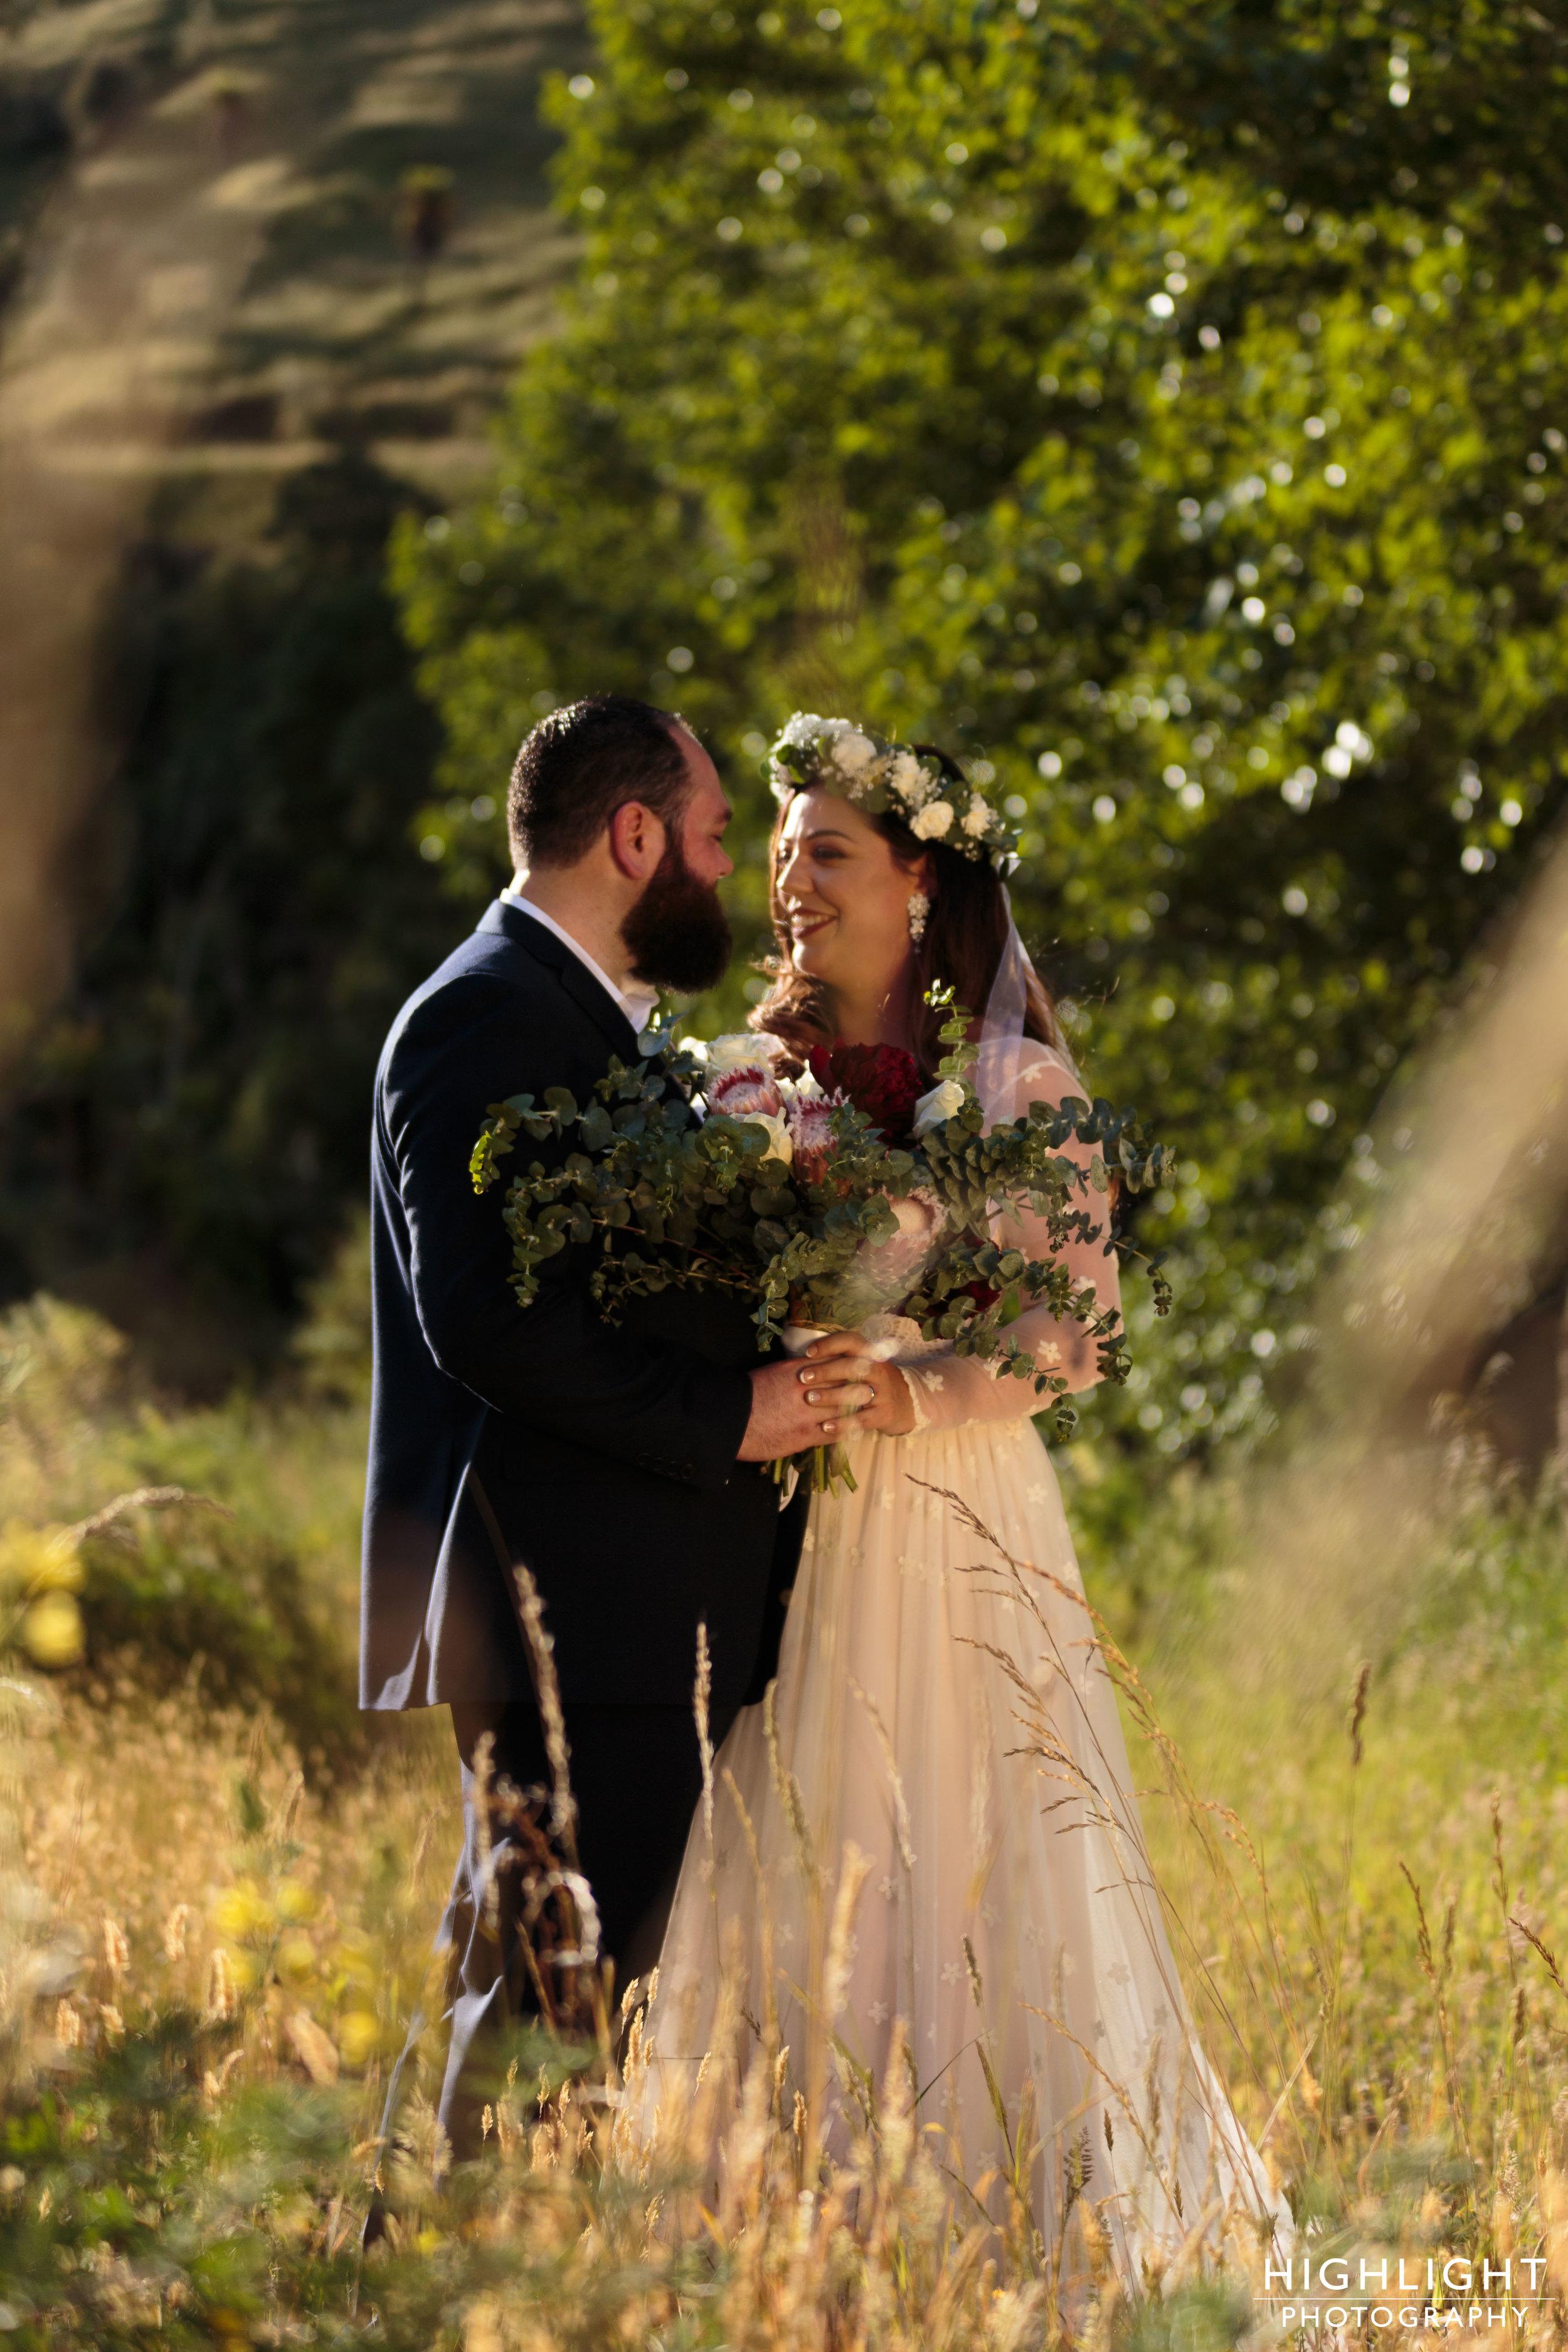 highlight-wedding-photography-new-zealand-makoura-lodge-wedding-144.jpg